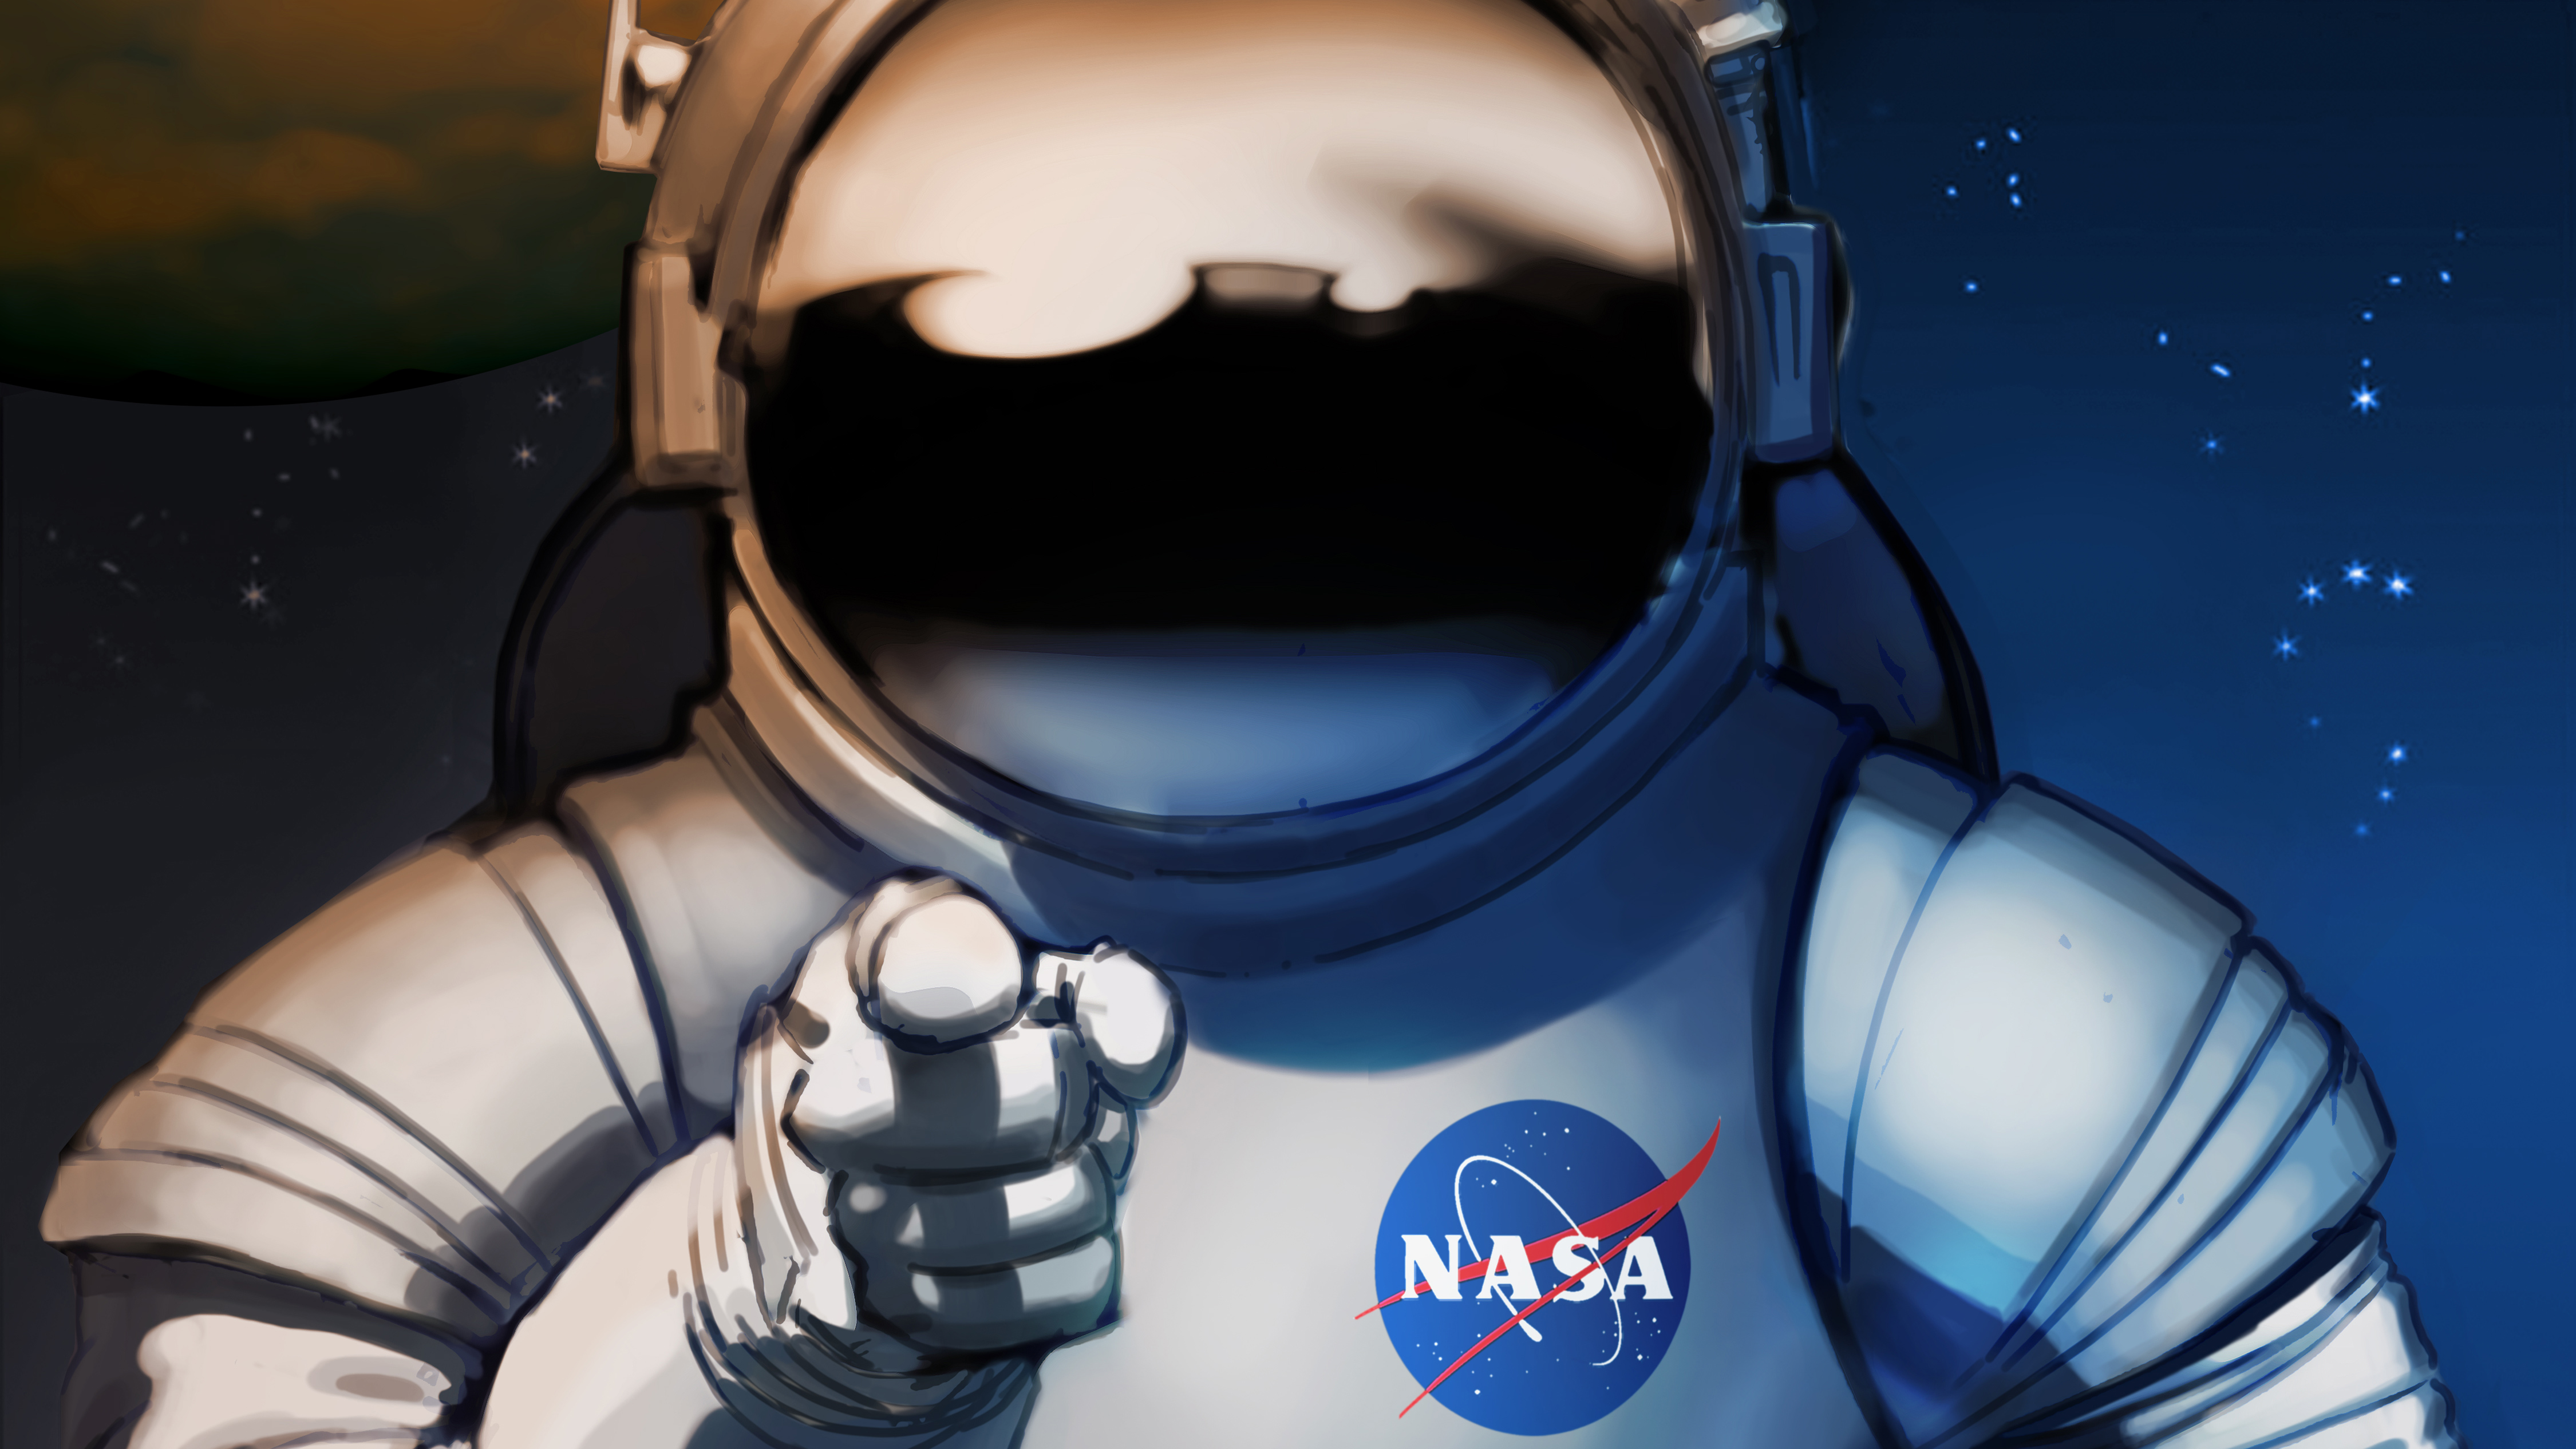 Wallpaper 4k Scifi Astronaut Space Man